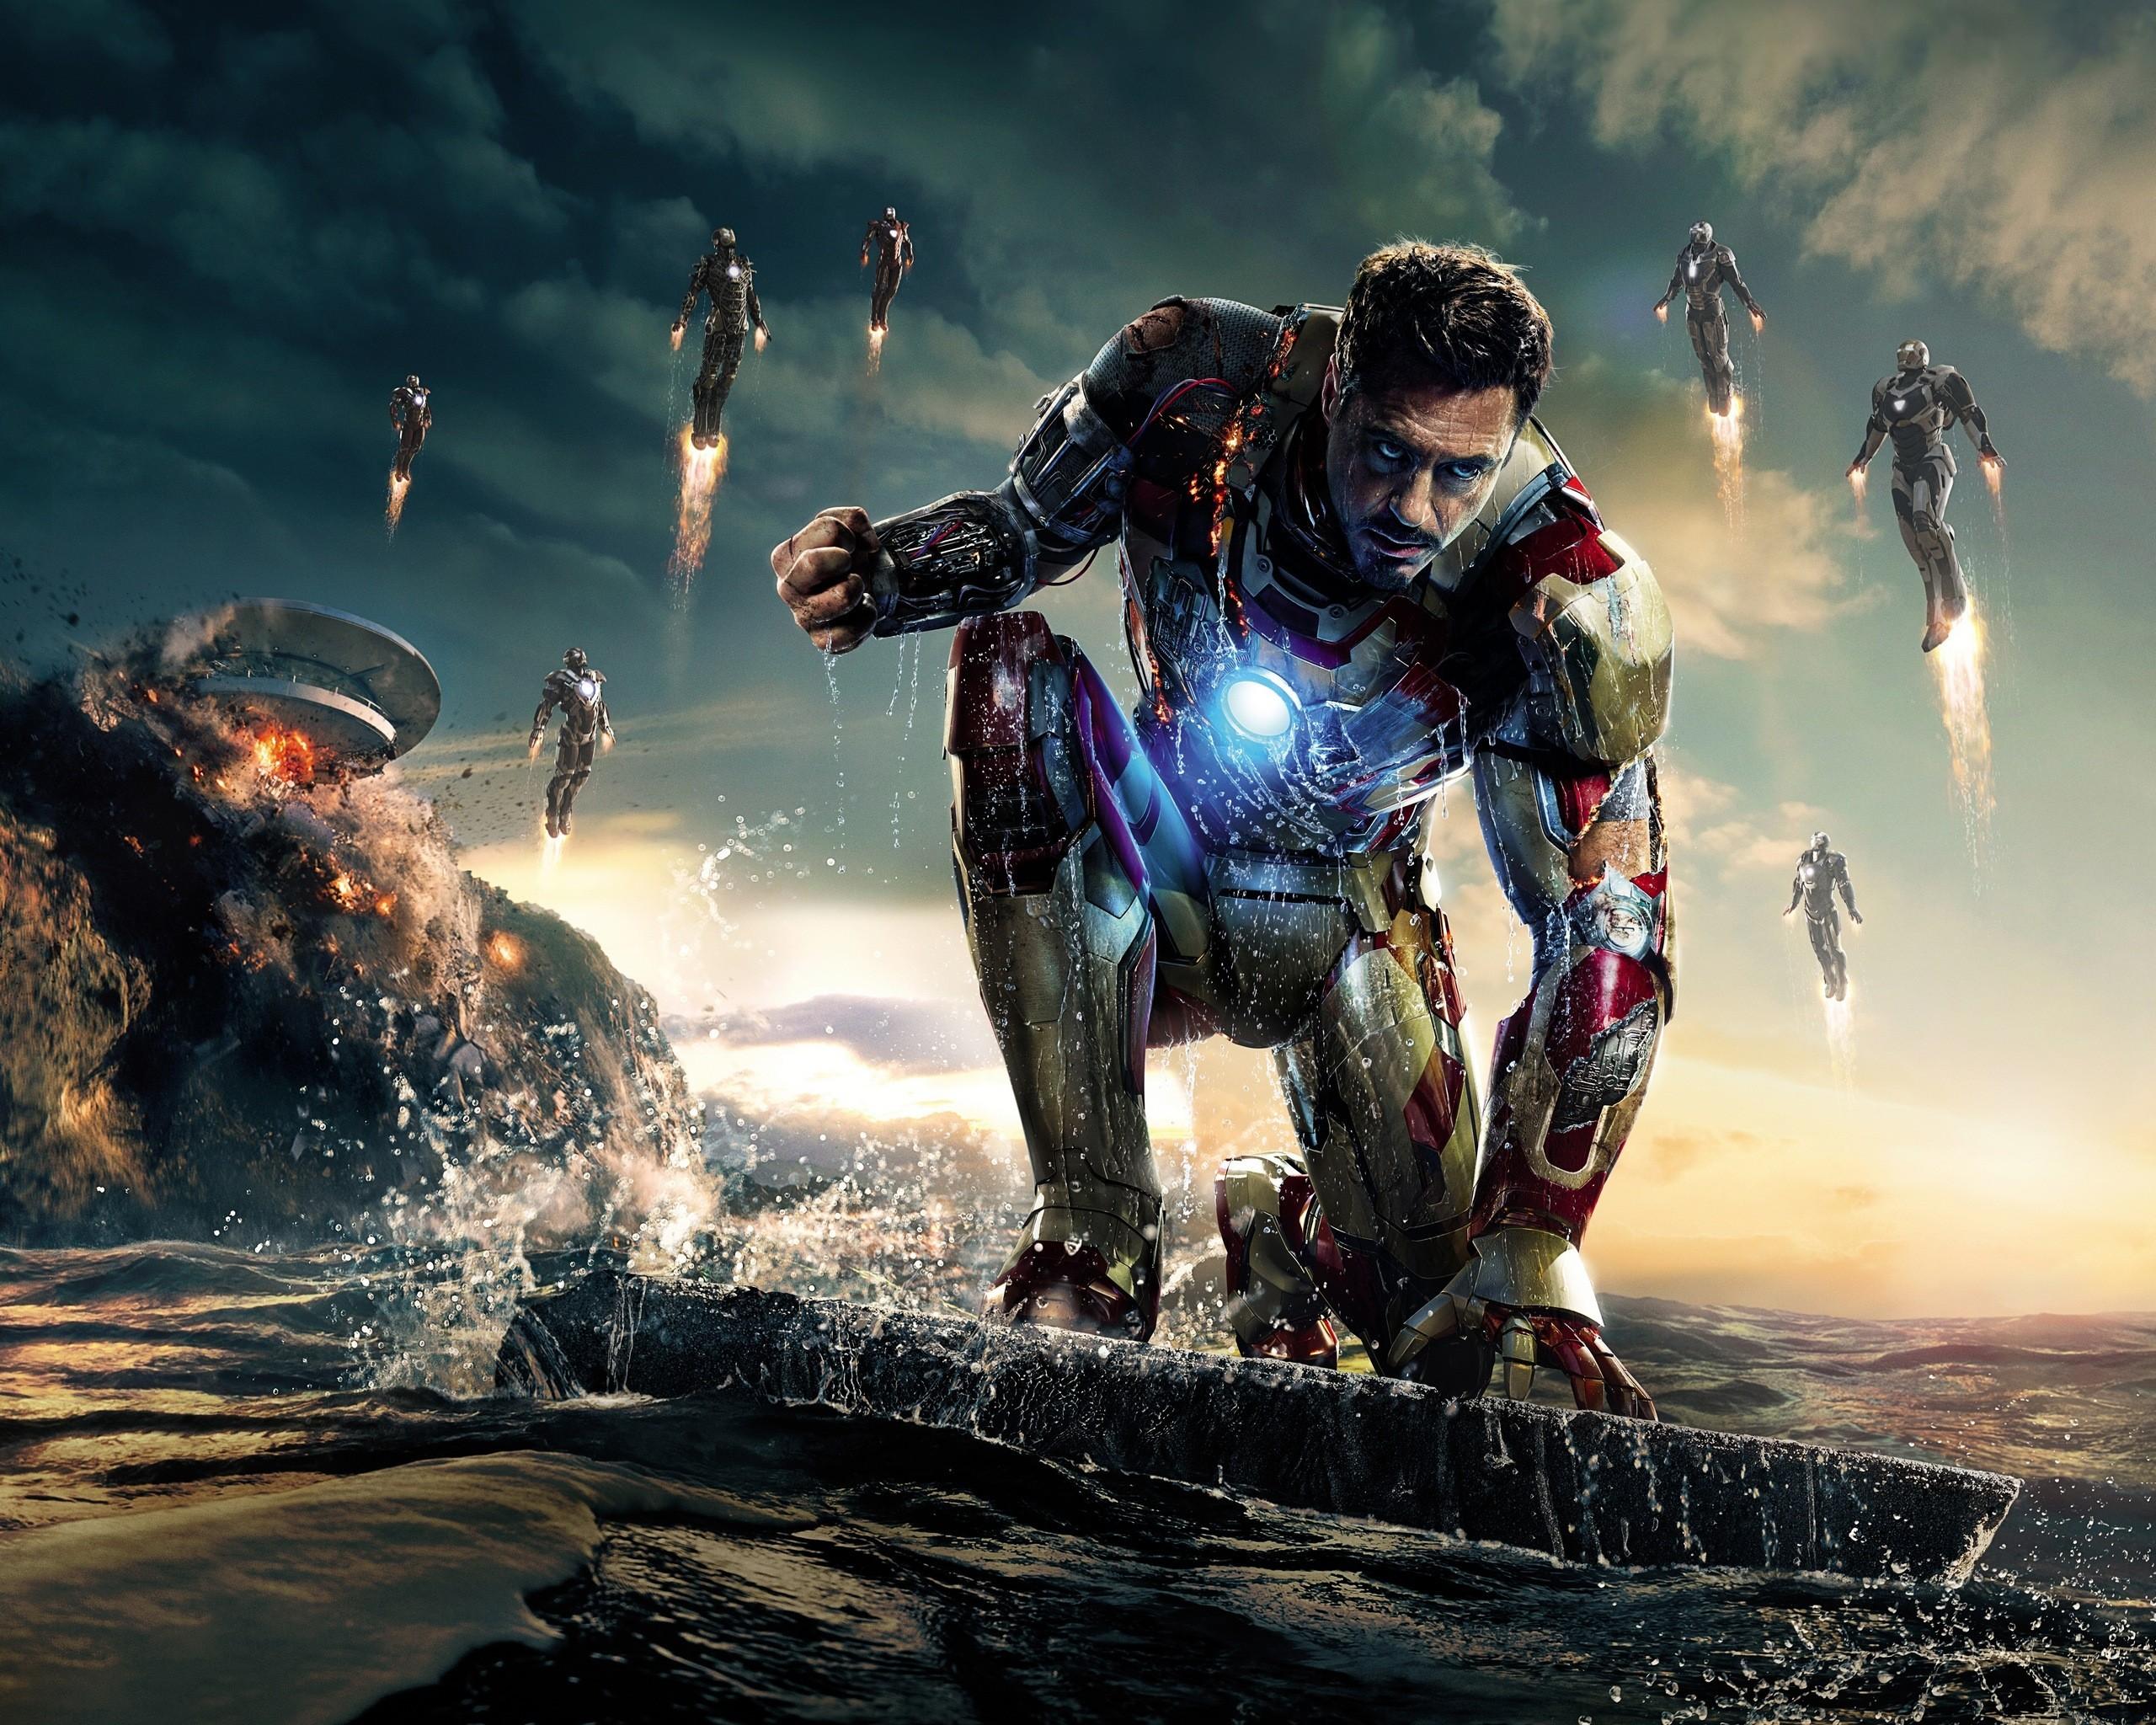 General 2560x2048 Iron Man Marvel Cinematic Universe movies Iron Man 3